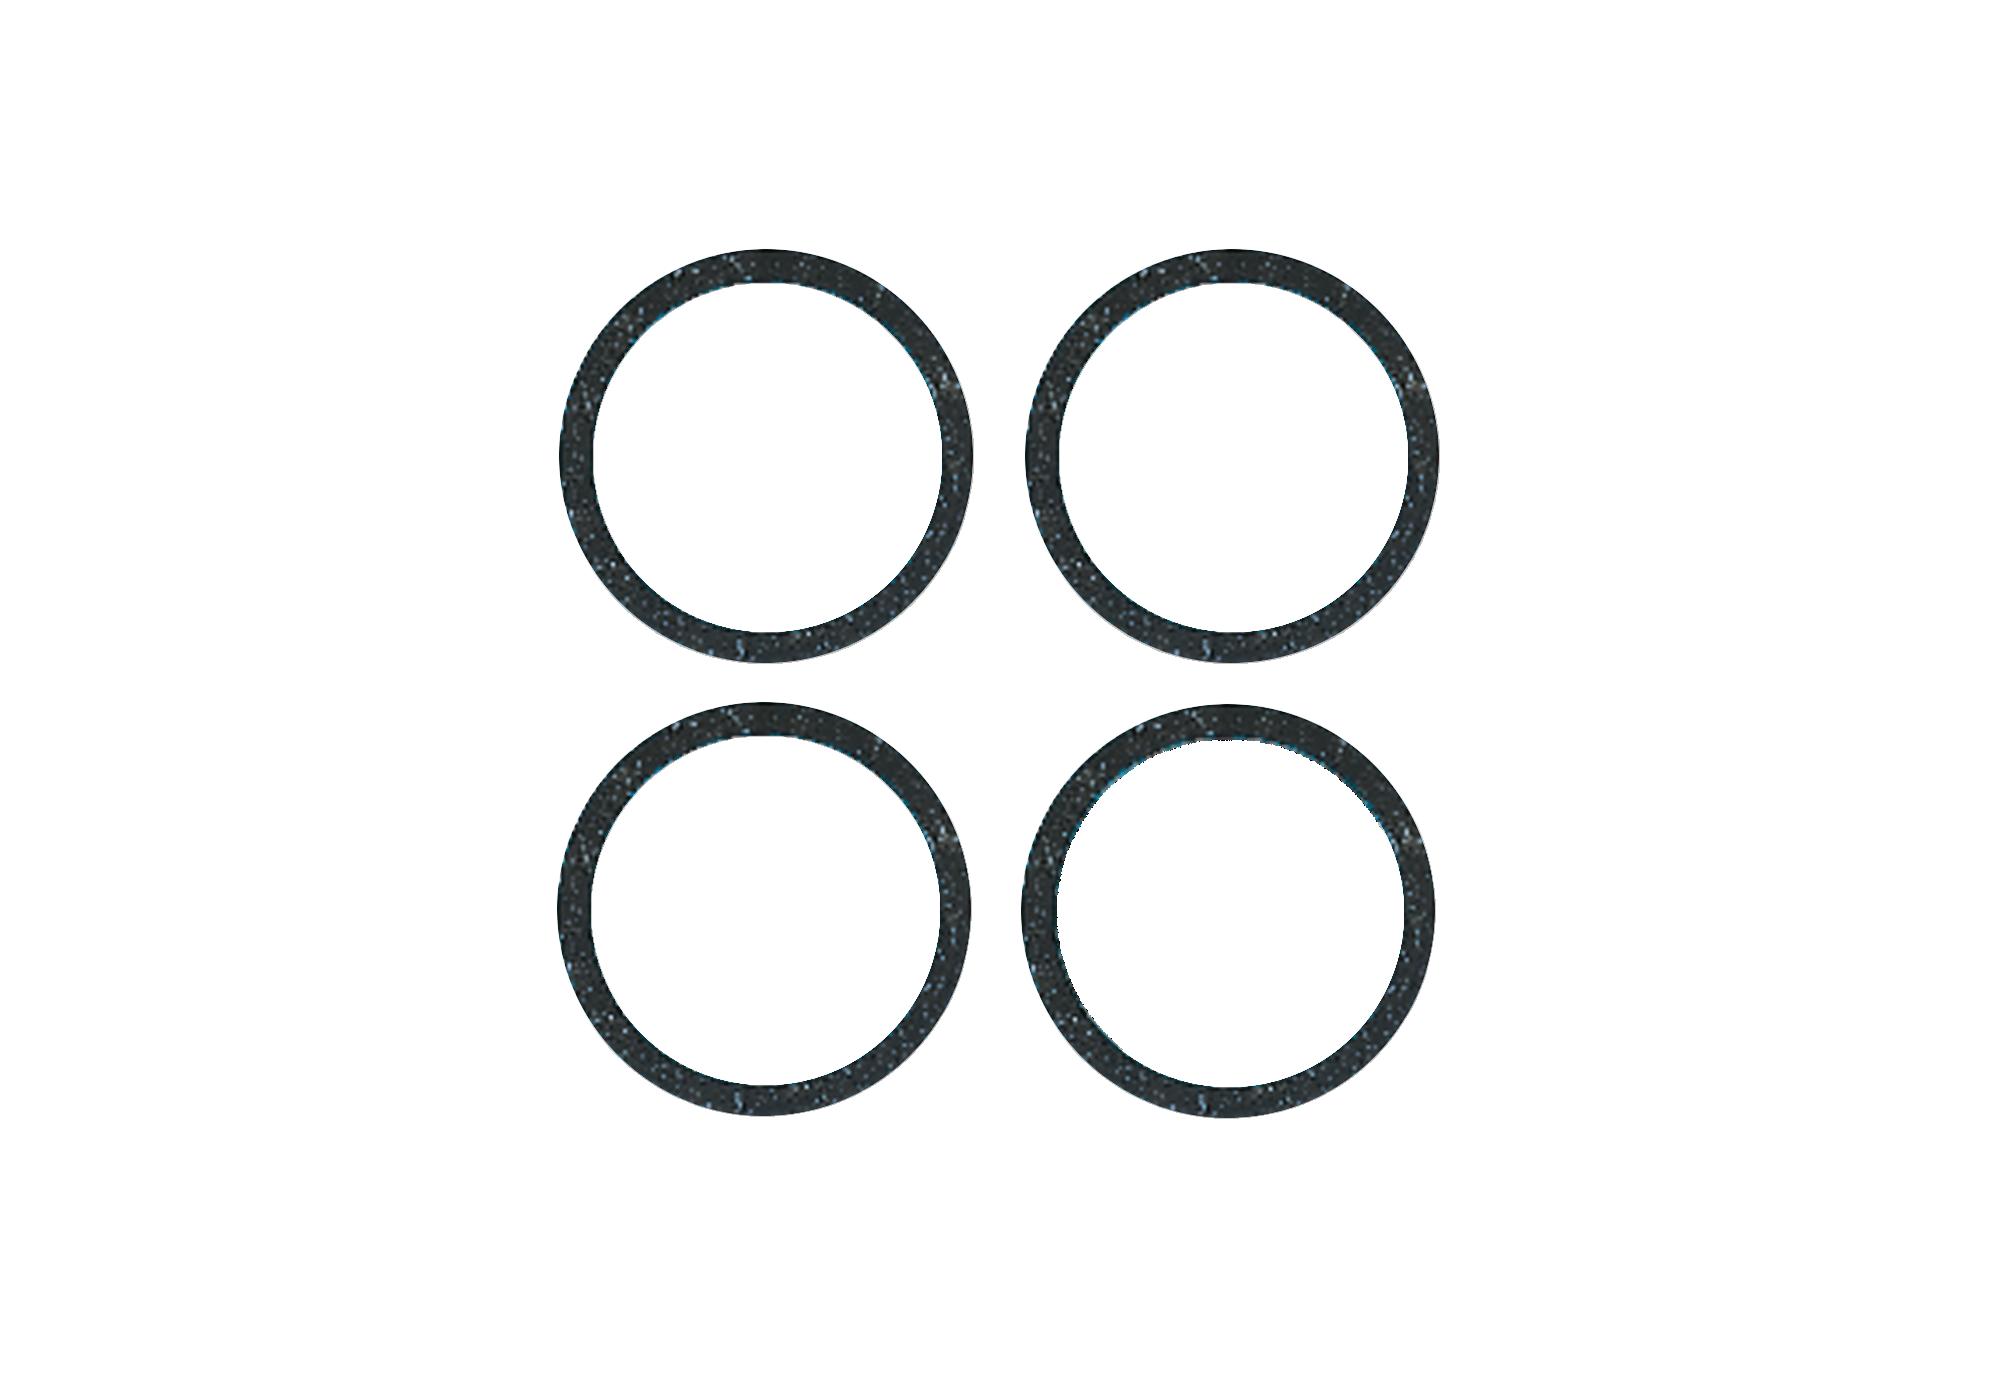 http://media.playmobil.com/i/playmobil/7231_product_detail/4 Anti-Skid Rings